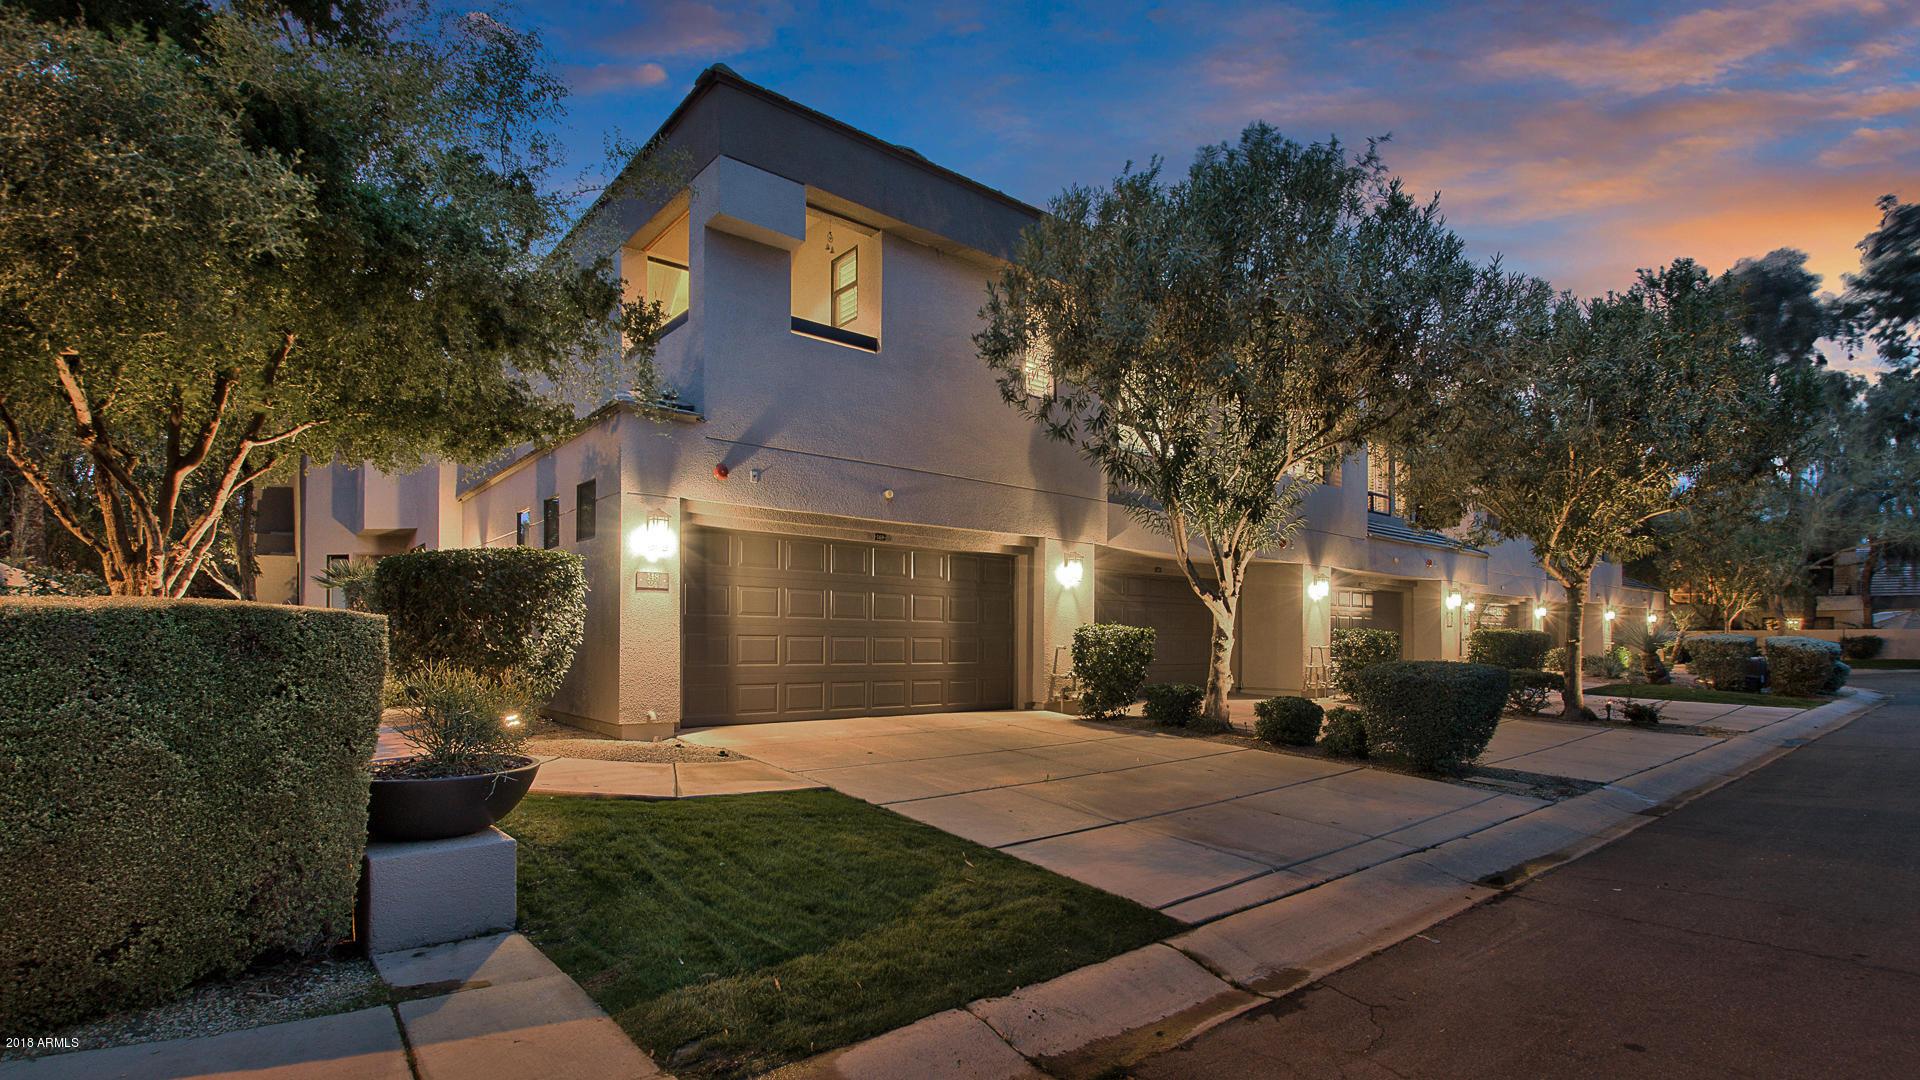 MLS 5856829 7400 E GAINEY CLUB Drive Unit 247, Scottsdale, AZ 85258 Scottsdale AZ Gainey Ranch